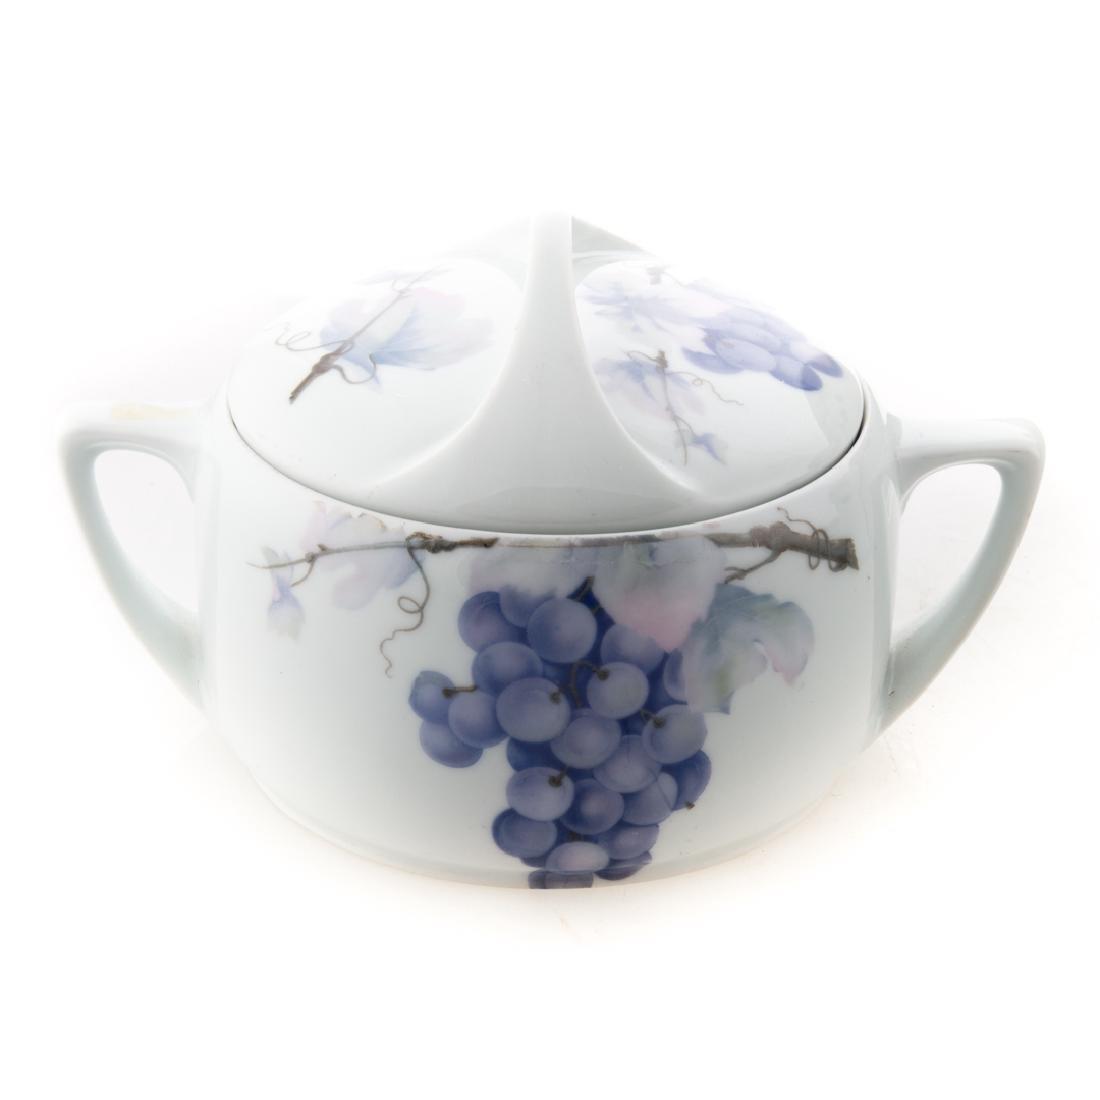 9 pcs. Rosenthal Pate-sur-Pate Donatello porcelain - 2